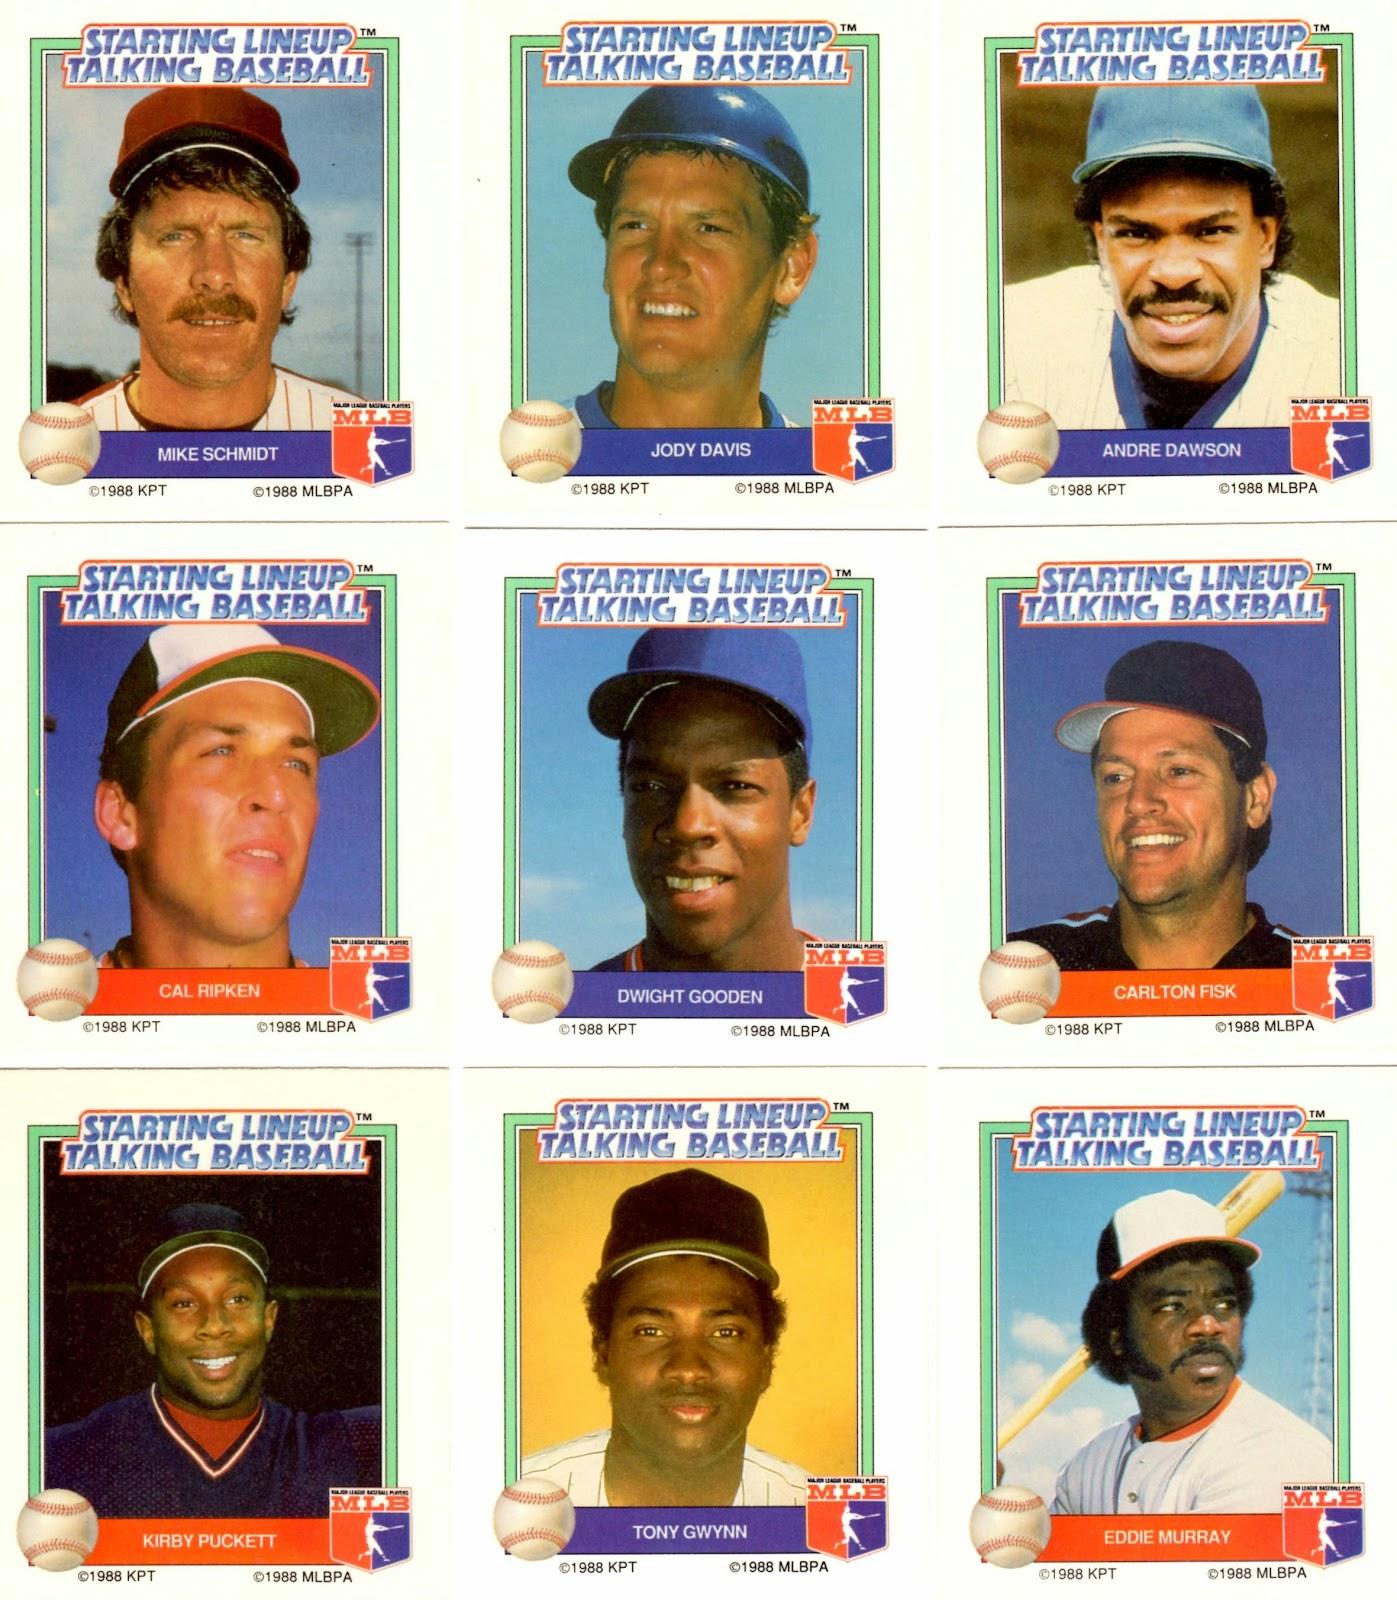 Electronic Baseball Parker Brothers Starting Lineup Talking Baseball